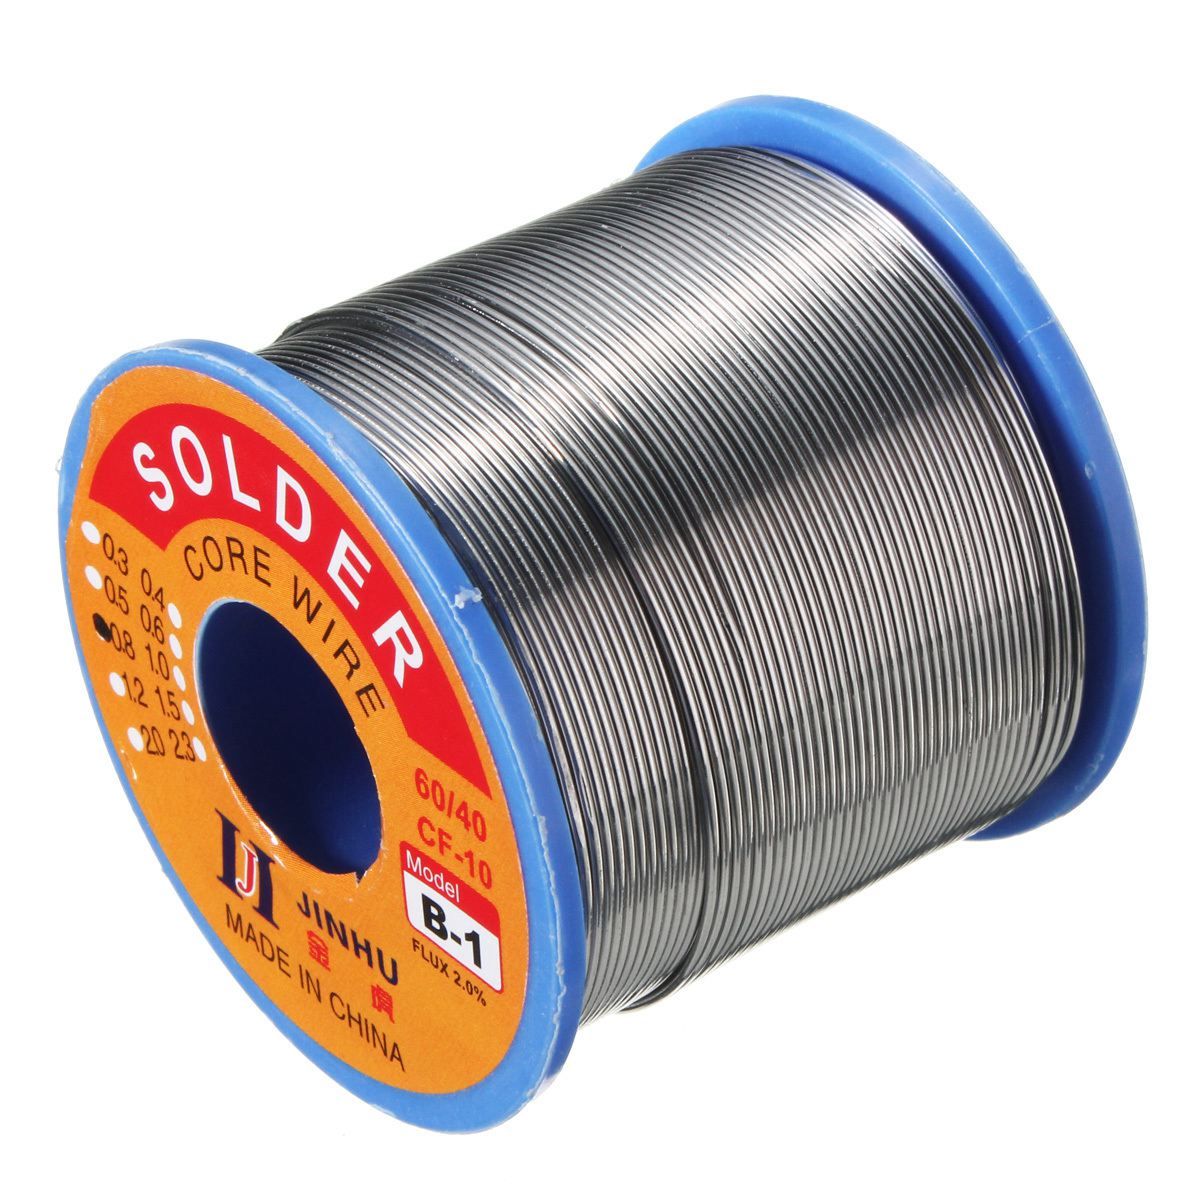 0.5/0.7/1MM 60/40 FLUX 2.0% 500g Tin Lead Solder Wire Melt Rosin Core Solder Soldering Wire Roll